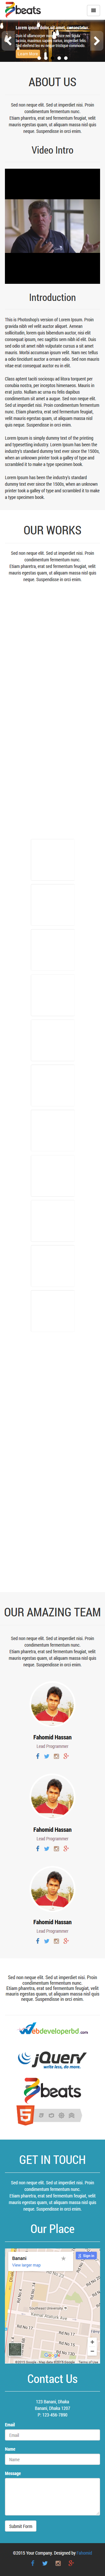 77beats.com Basic Portfolio HTML5 Theme